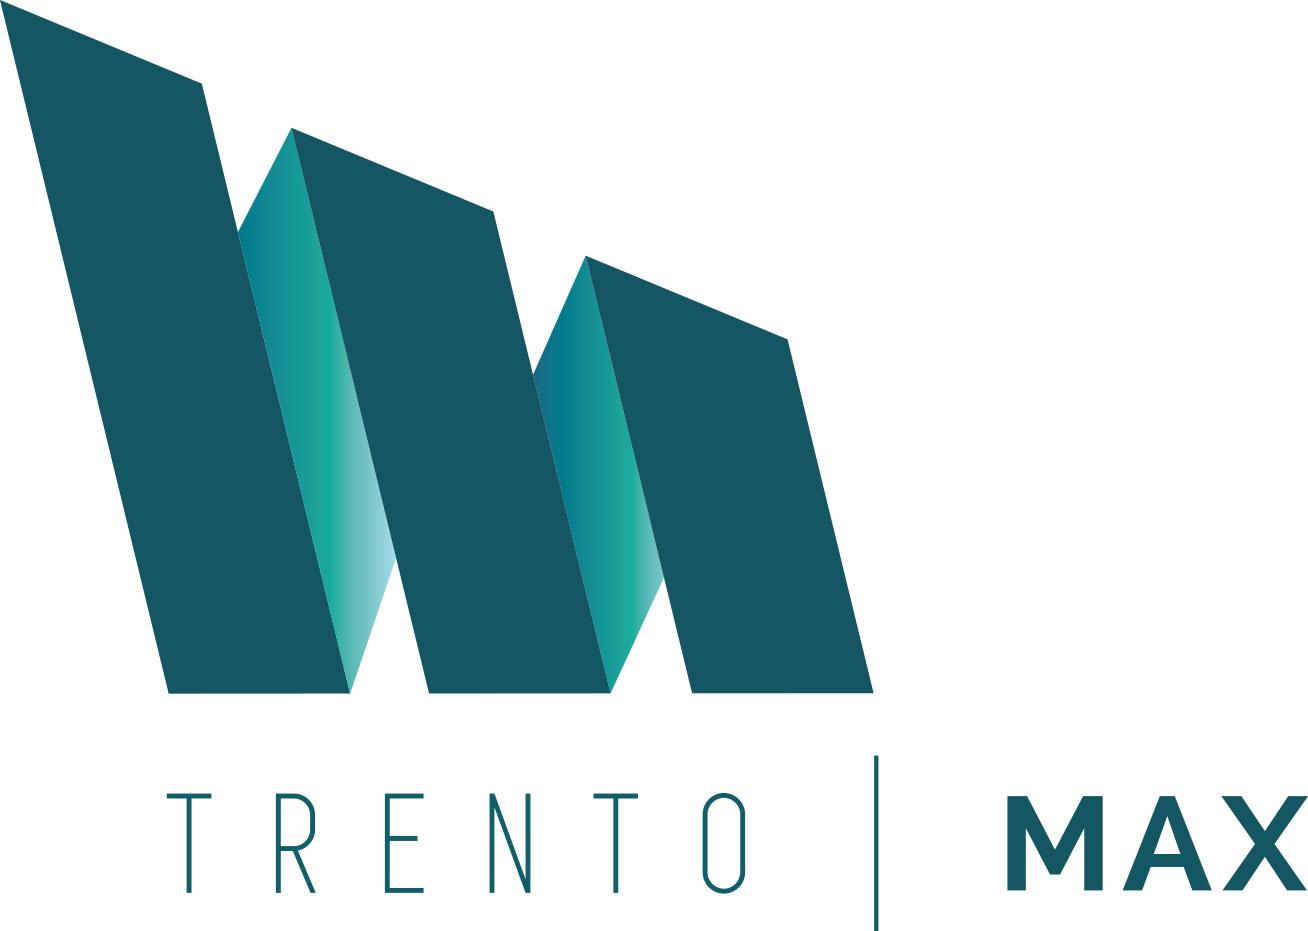 AAFF_Trento-MAX_220216-1